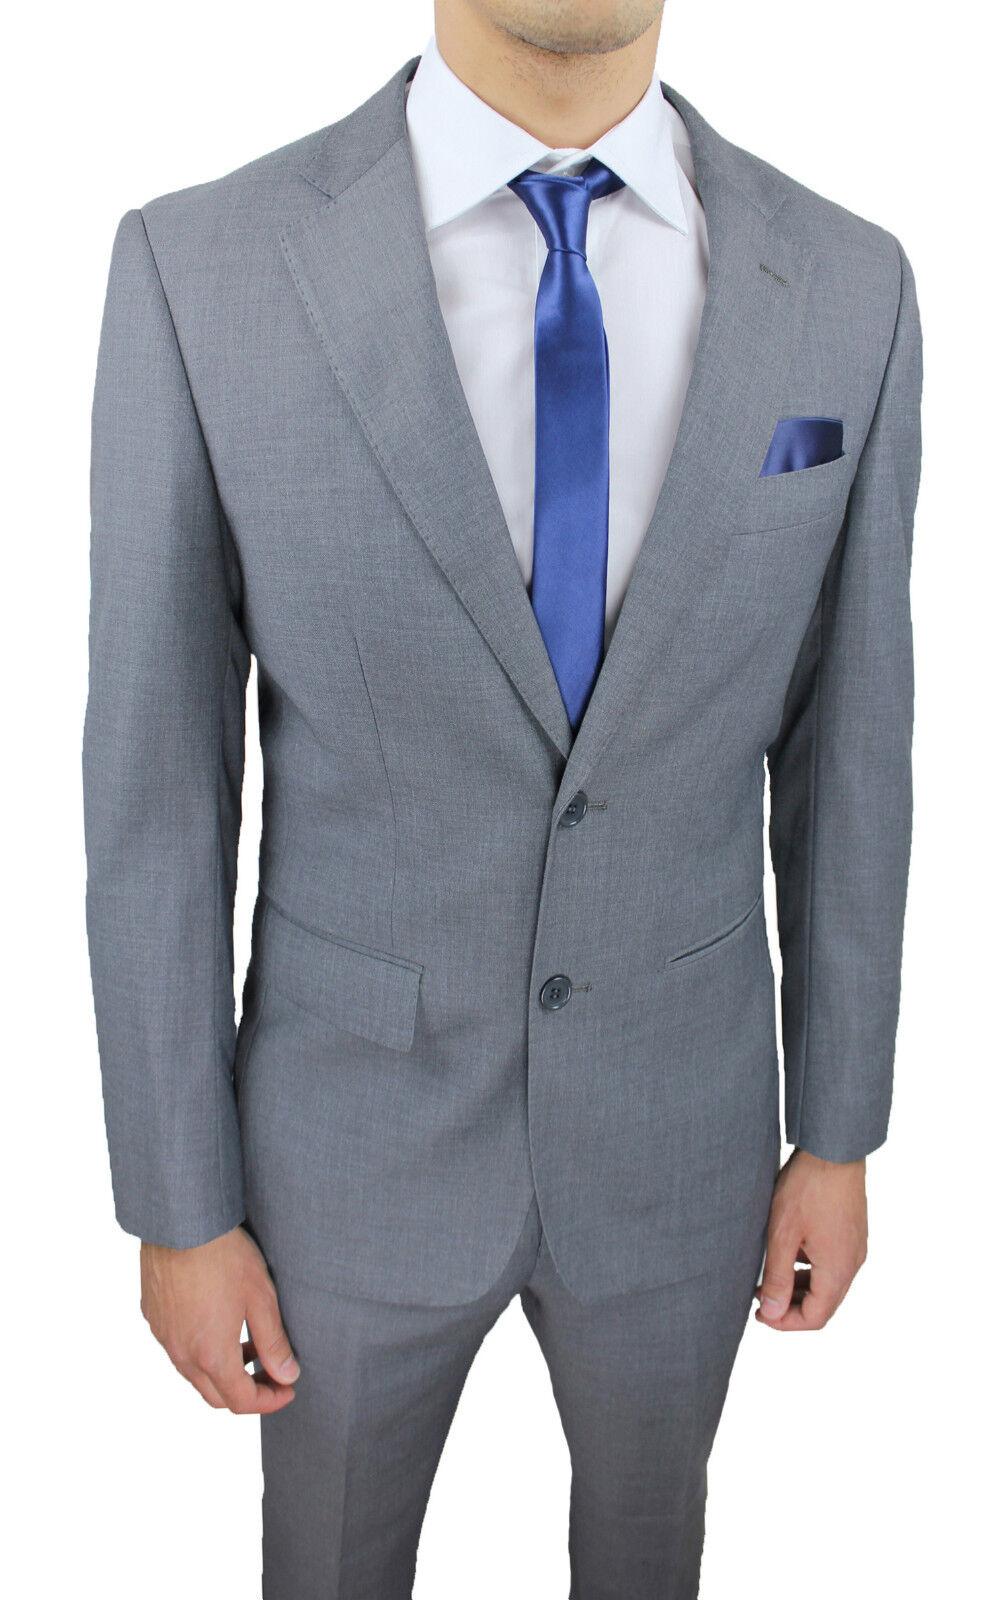 8679df6d74b ABITO COMPLETO men grey SLIM ELEGANTE CERIMONIA da 44 a 56 FIT SARTORIALE  nfpwcp6550-Suits   Tailoring